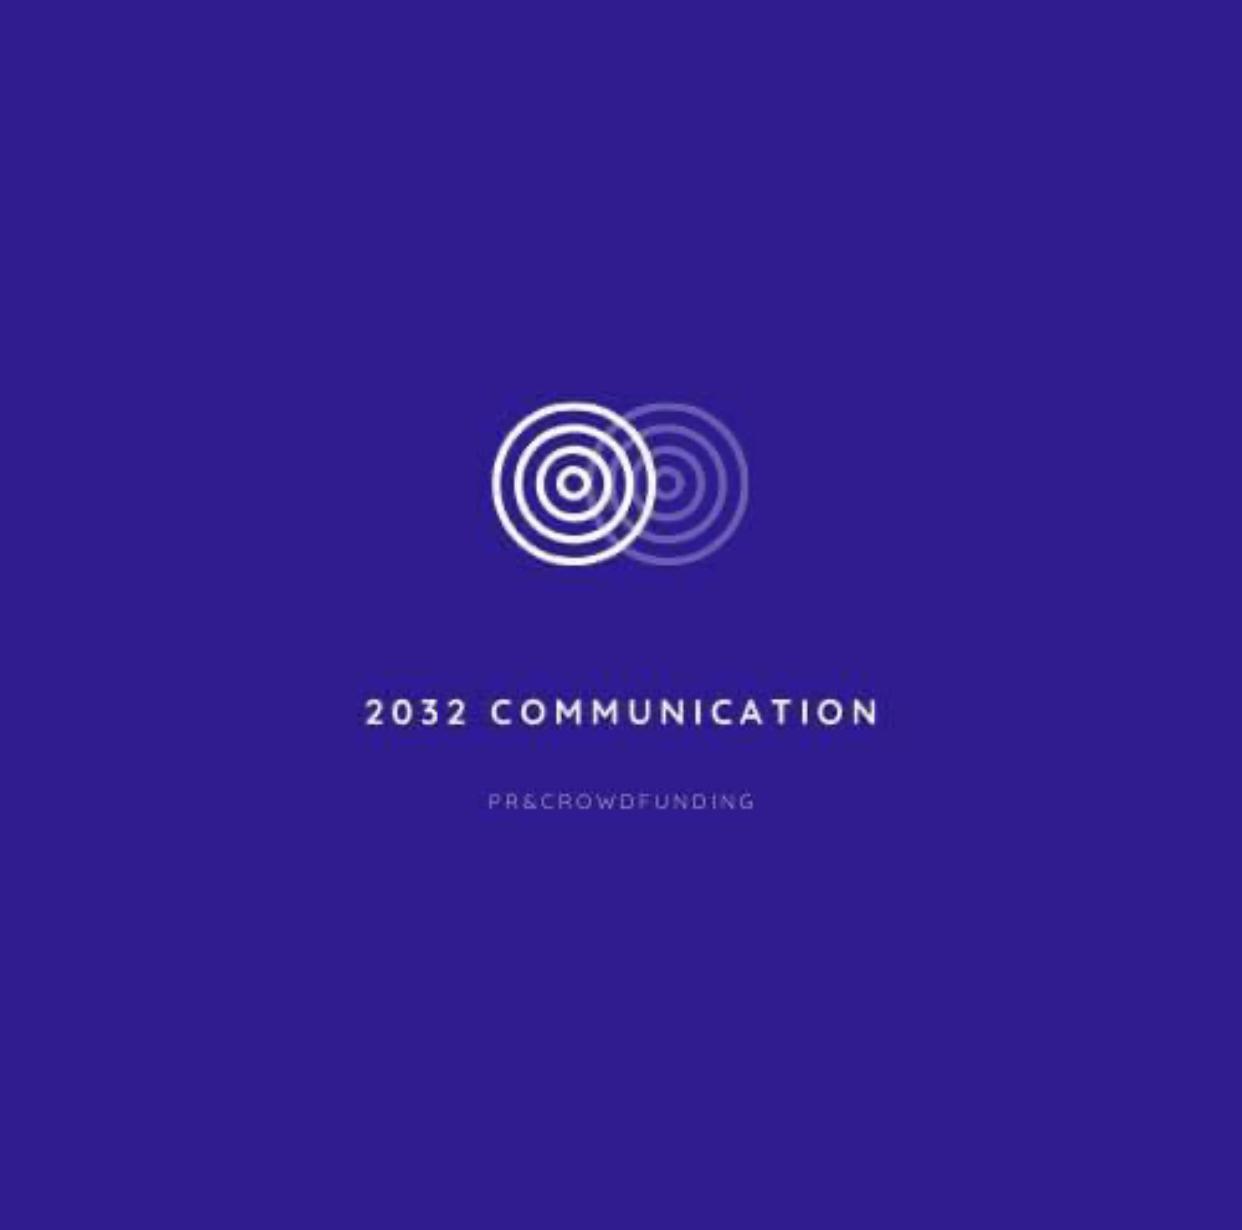 2032communication